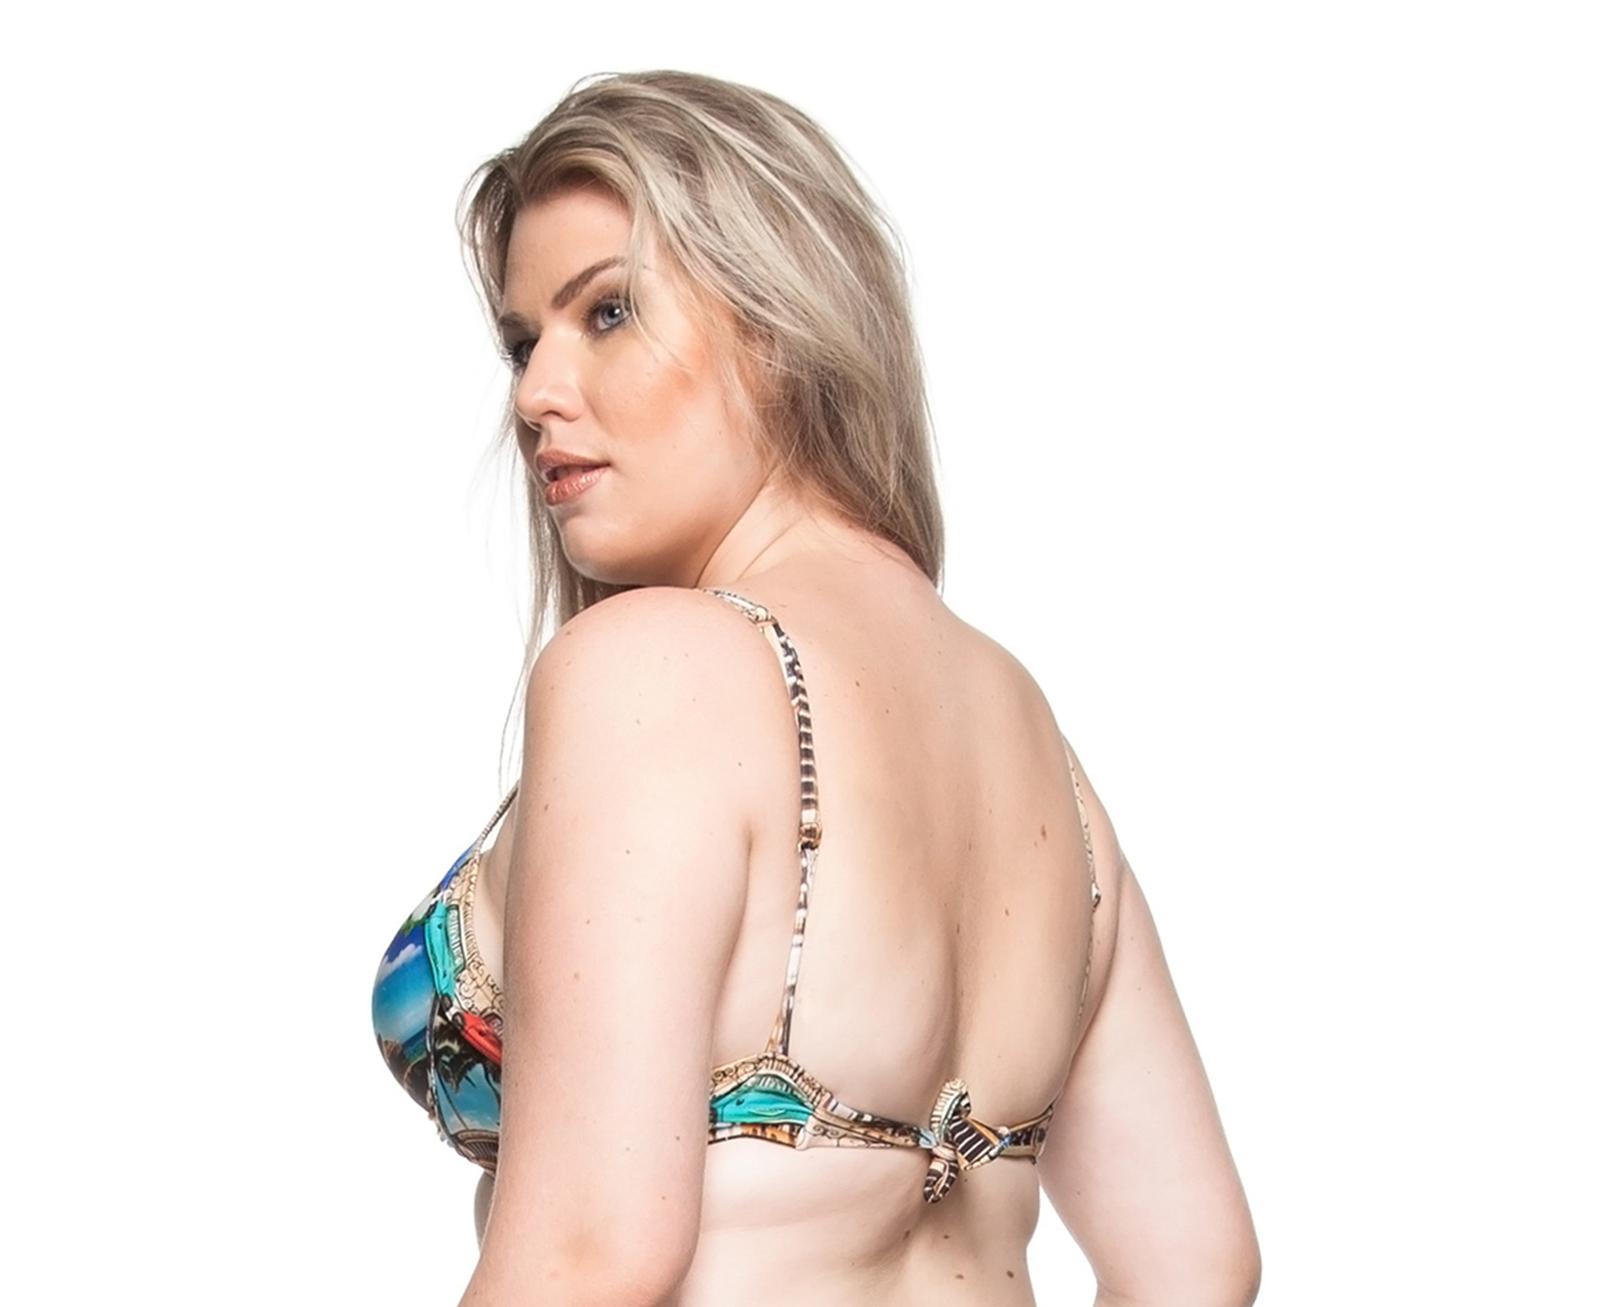 1e8b500725 ... Plus-size balconette bikini top with stones - TOP PRAIA DE PILAR